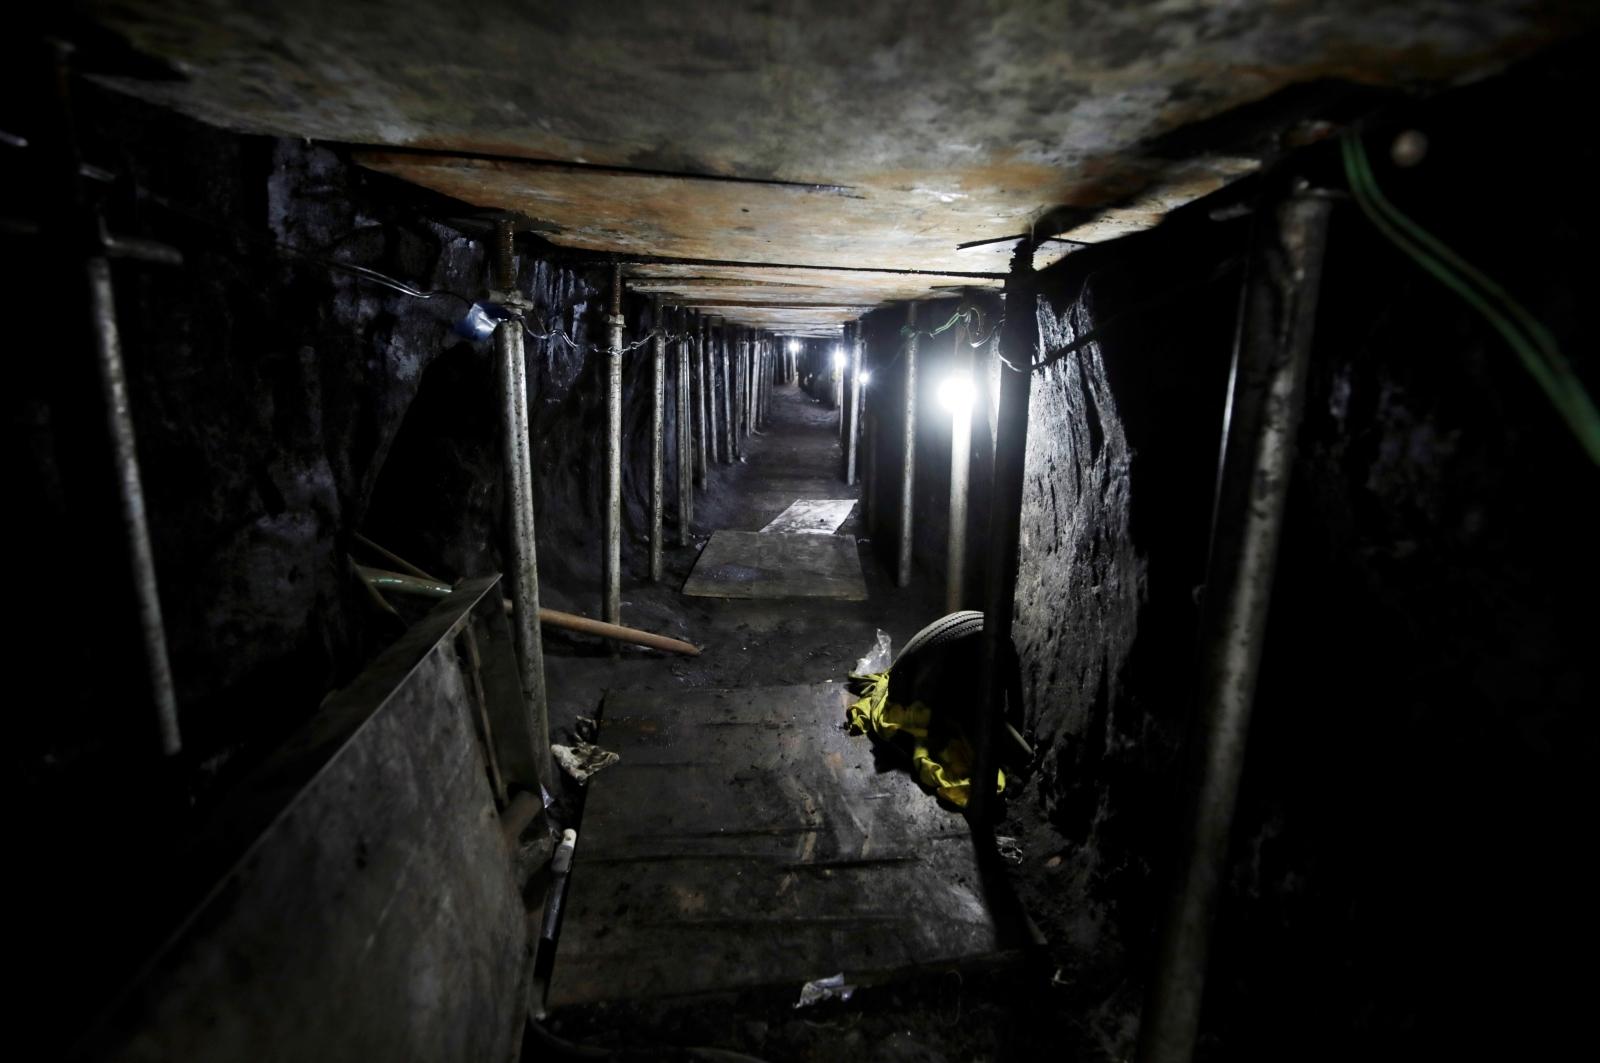 Brazil bank tunnel